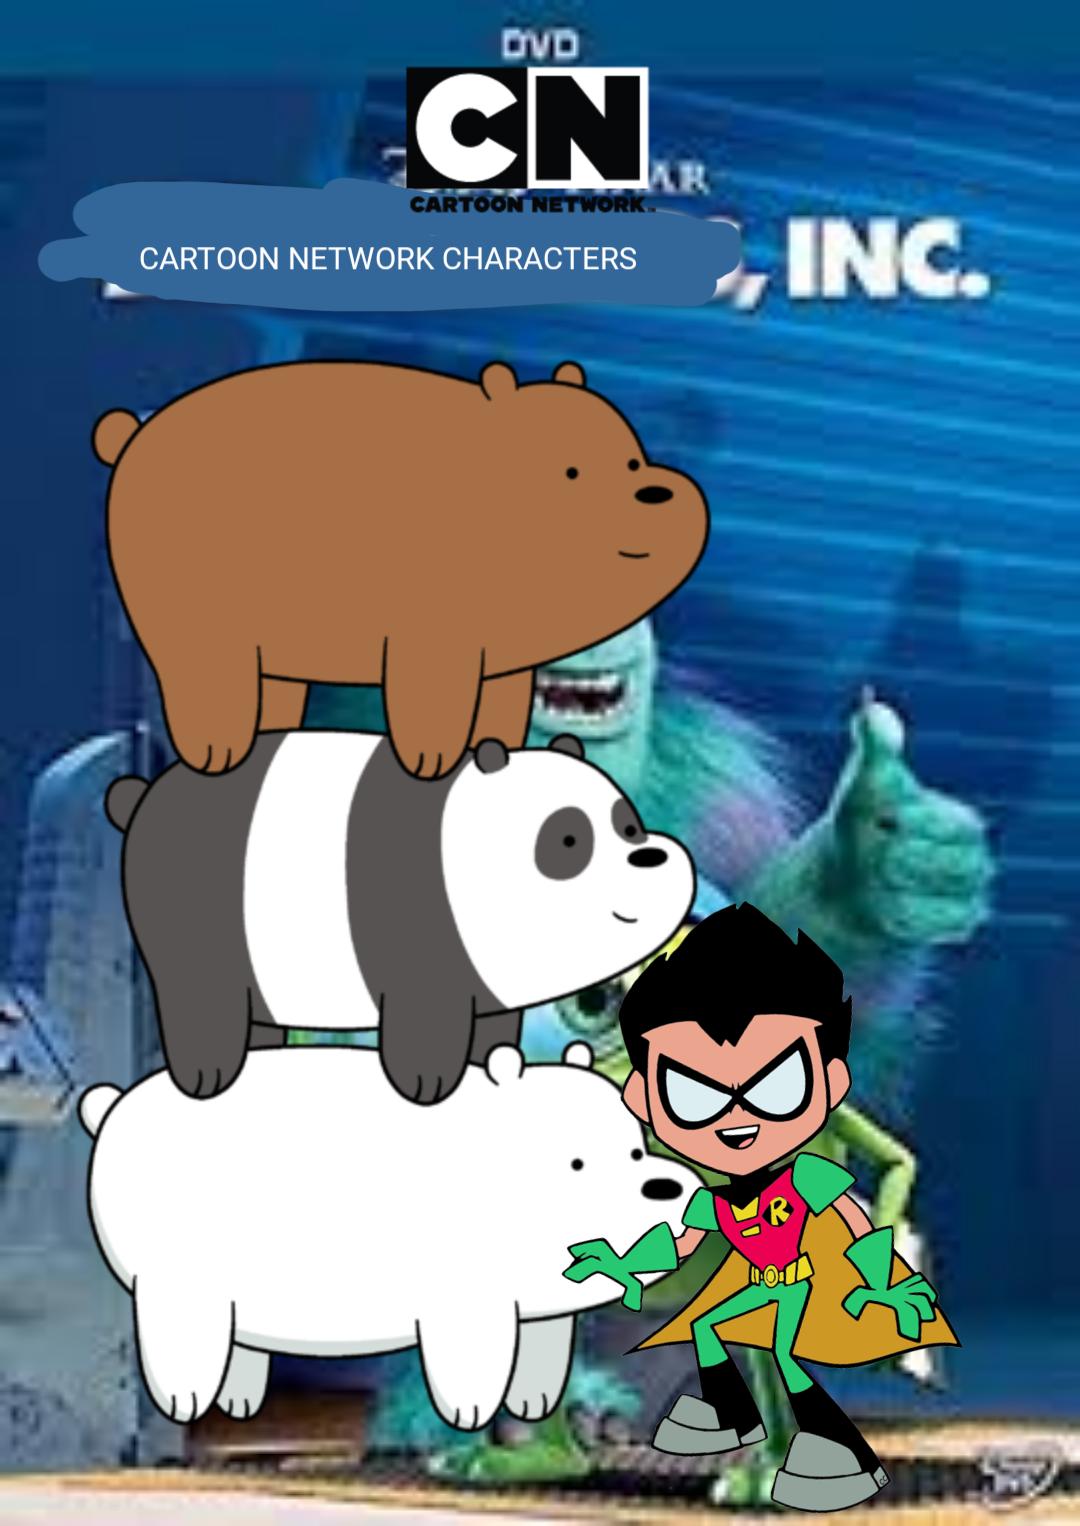 Cartoon Network Characters, Inc. (Cartoon Network Style)